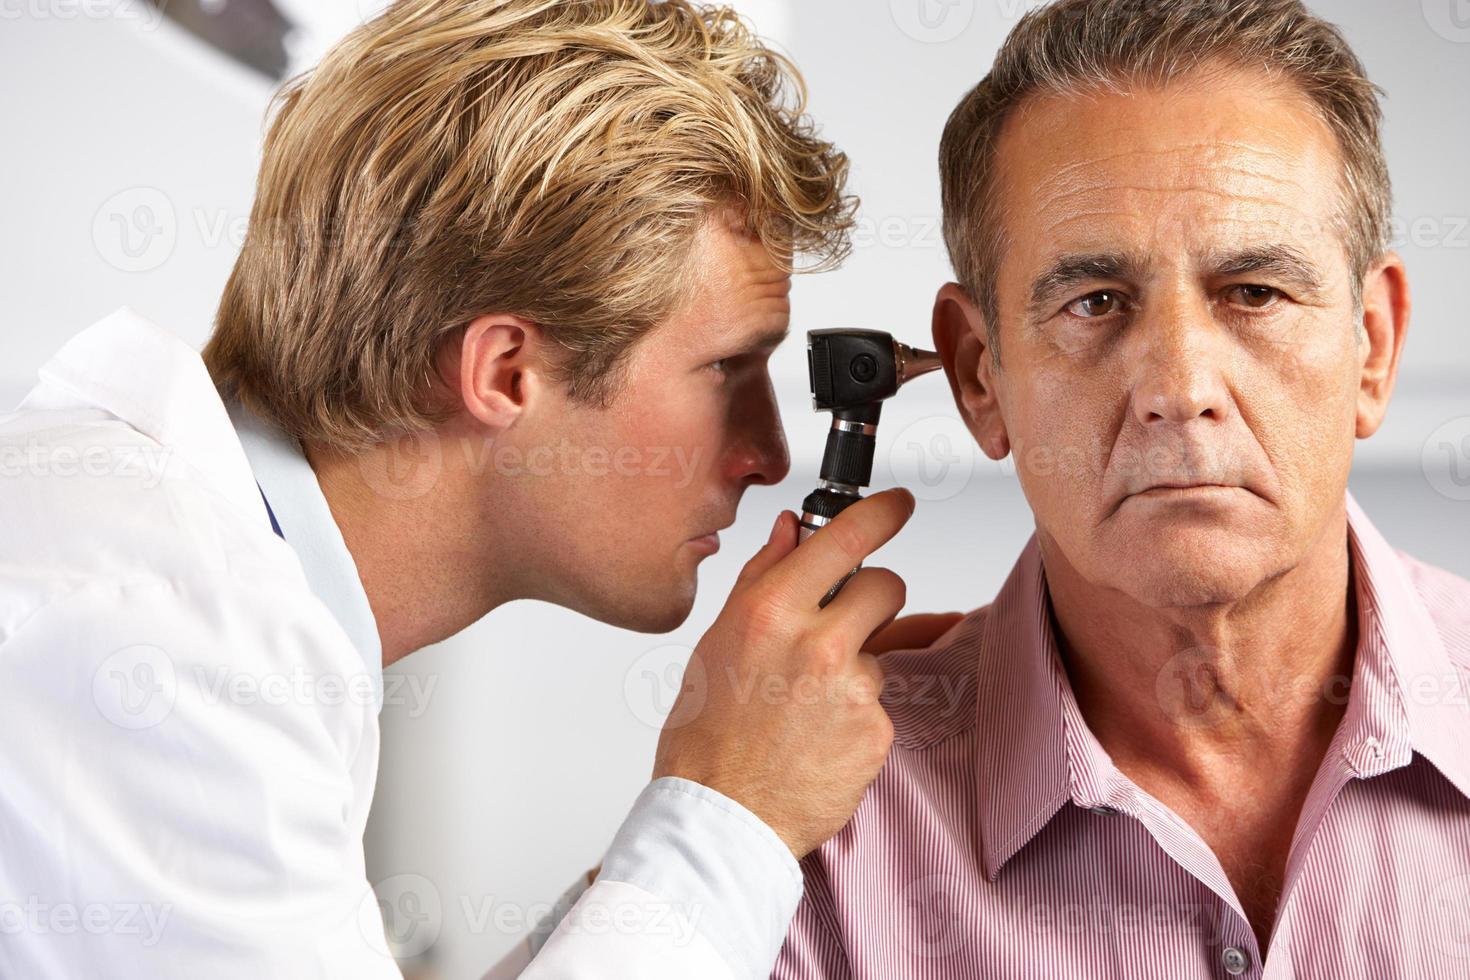 médico examinando as orelhas do paciente do sexo masculino foto